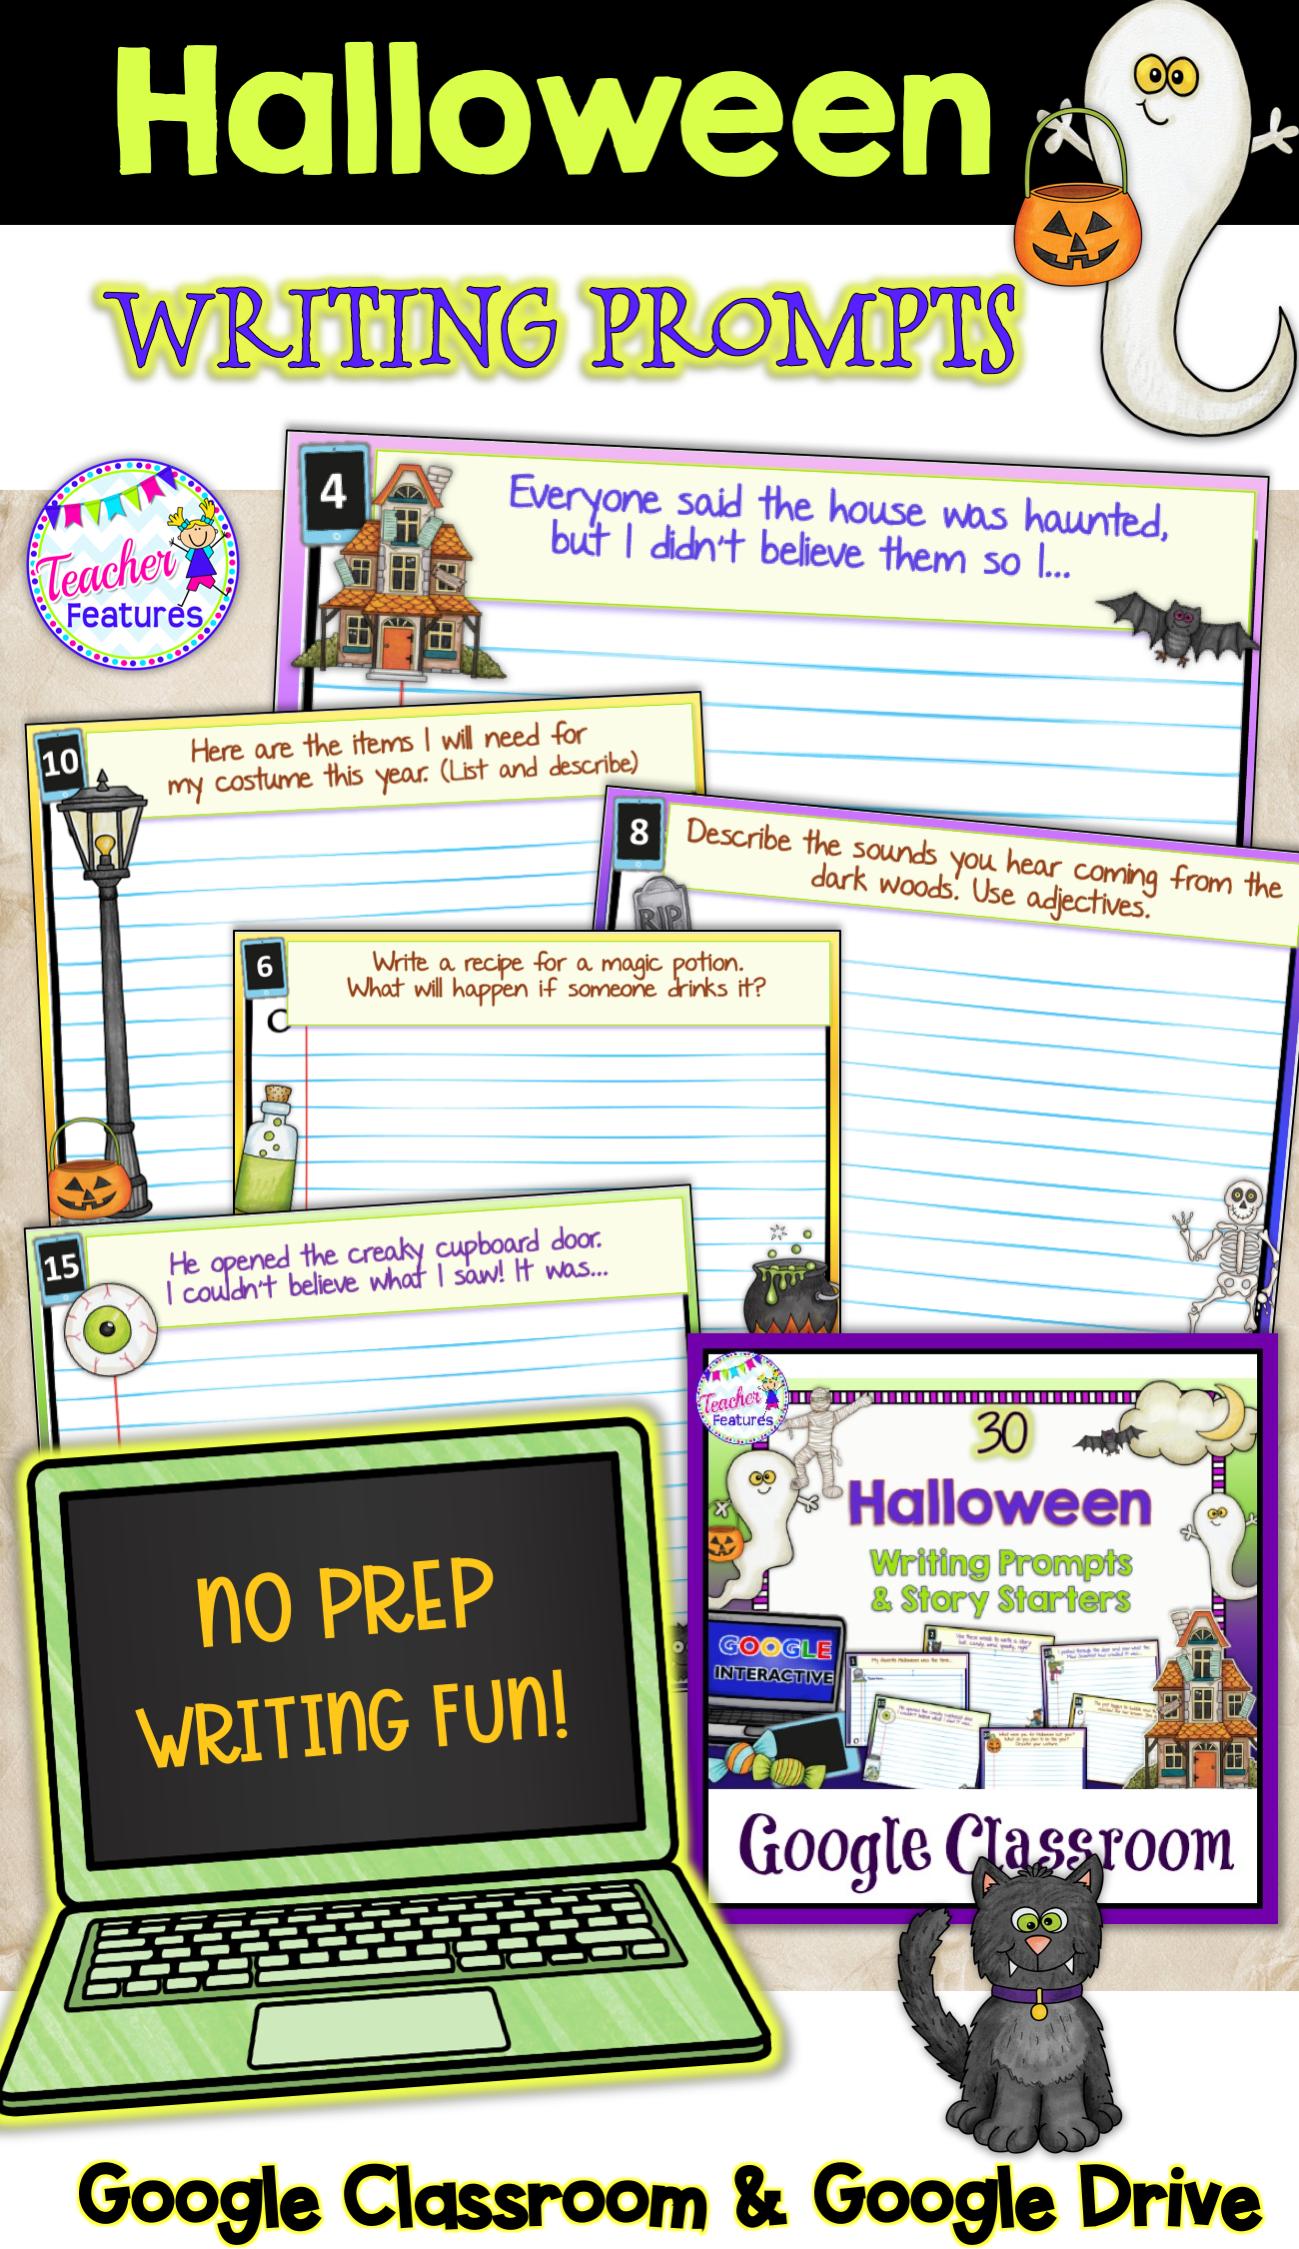 Classroom Halloween Digital Writing Prompts